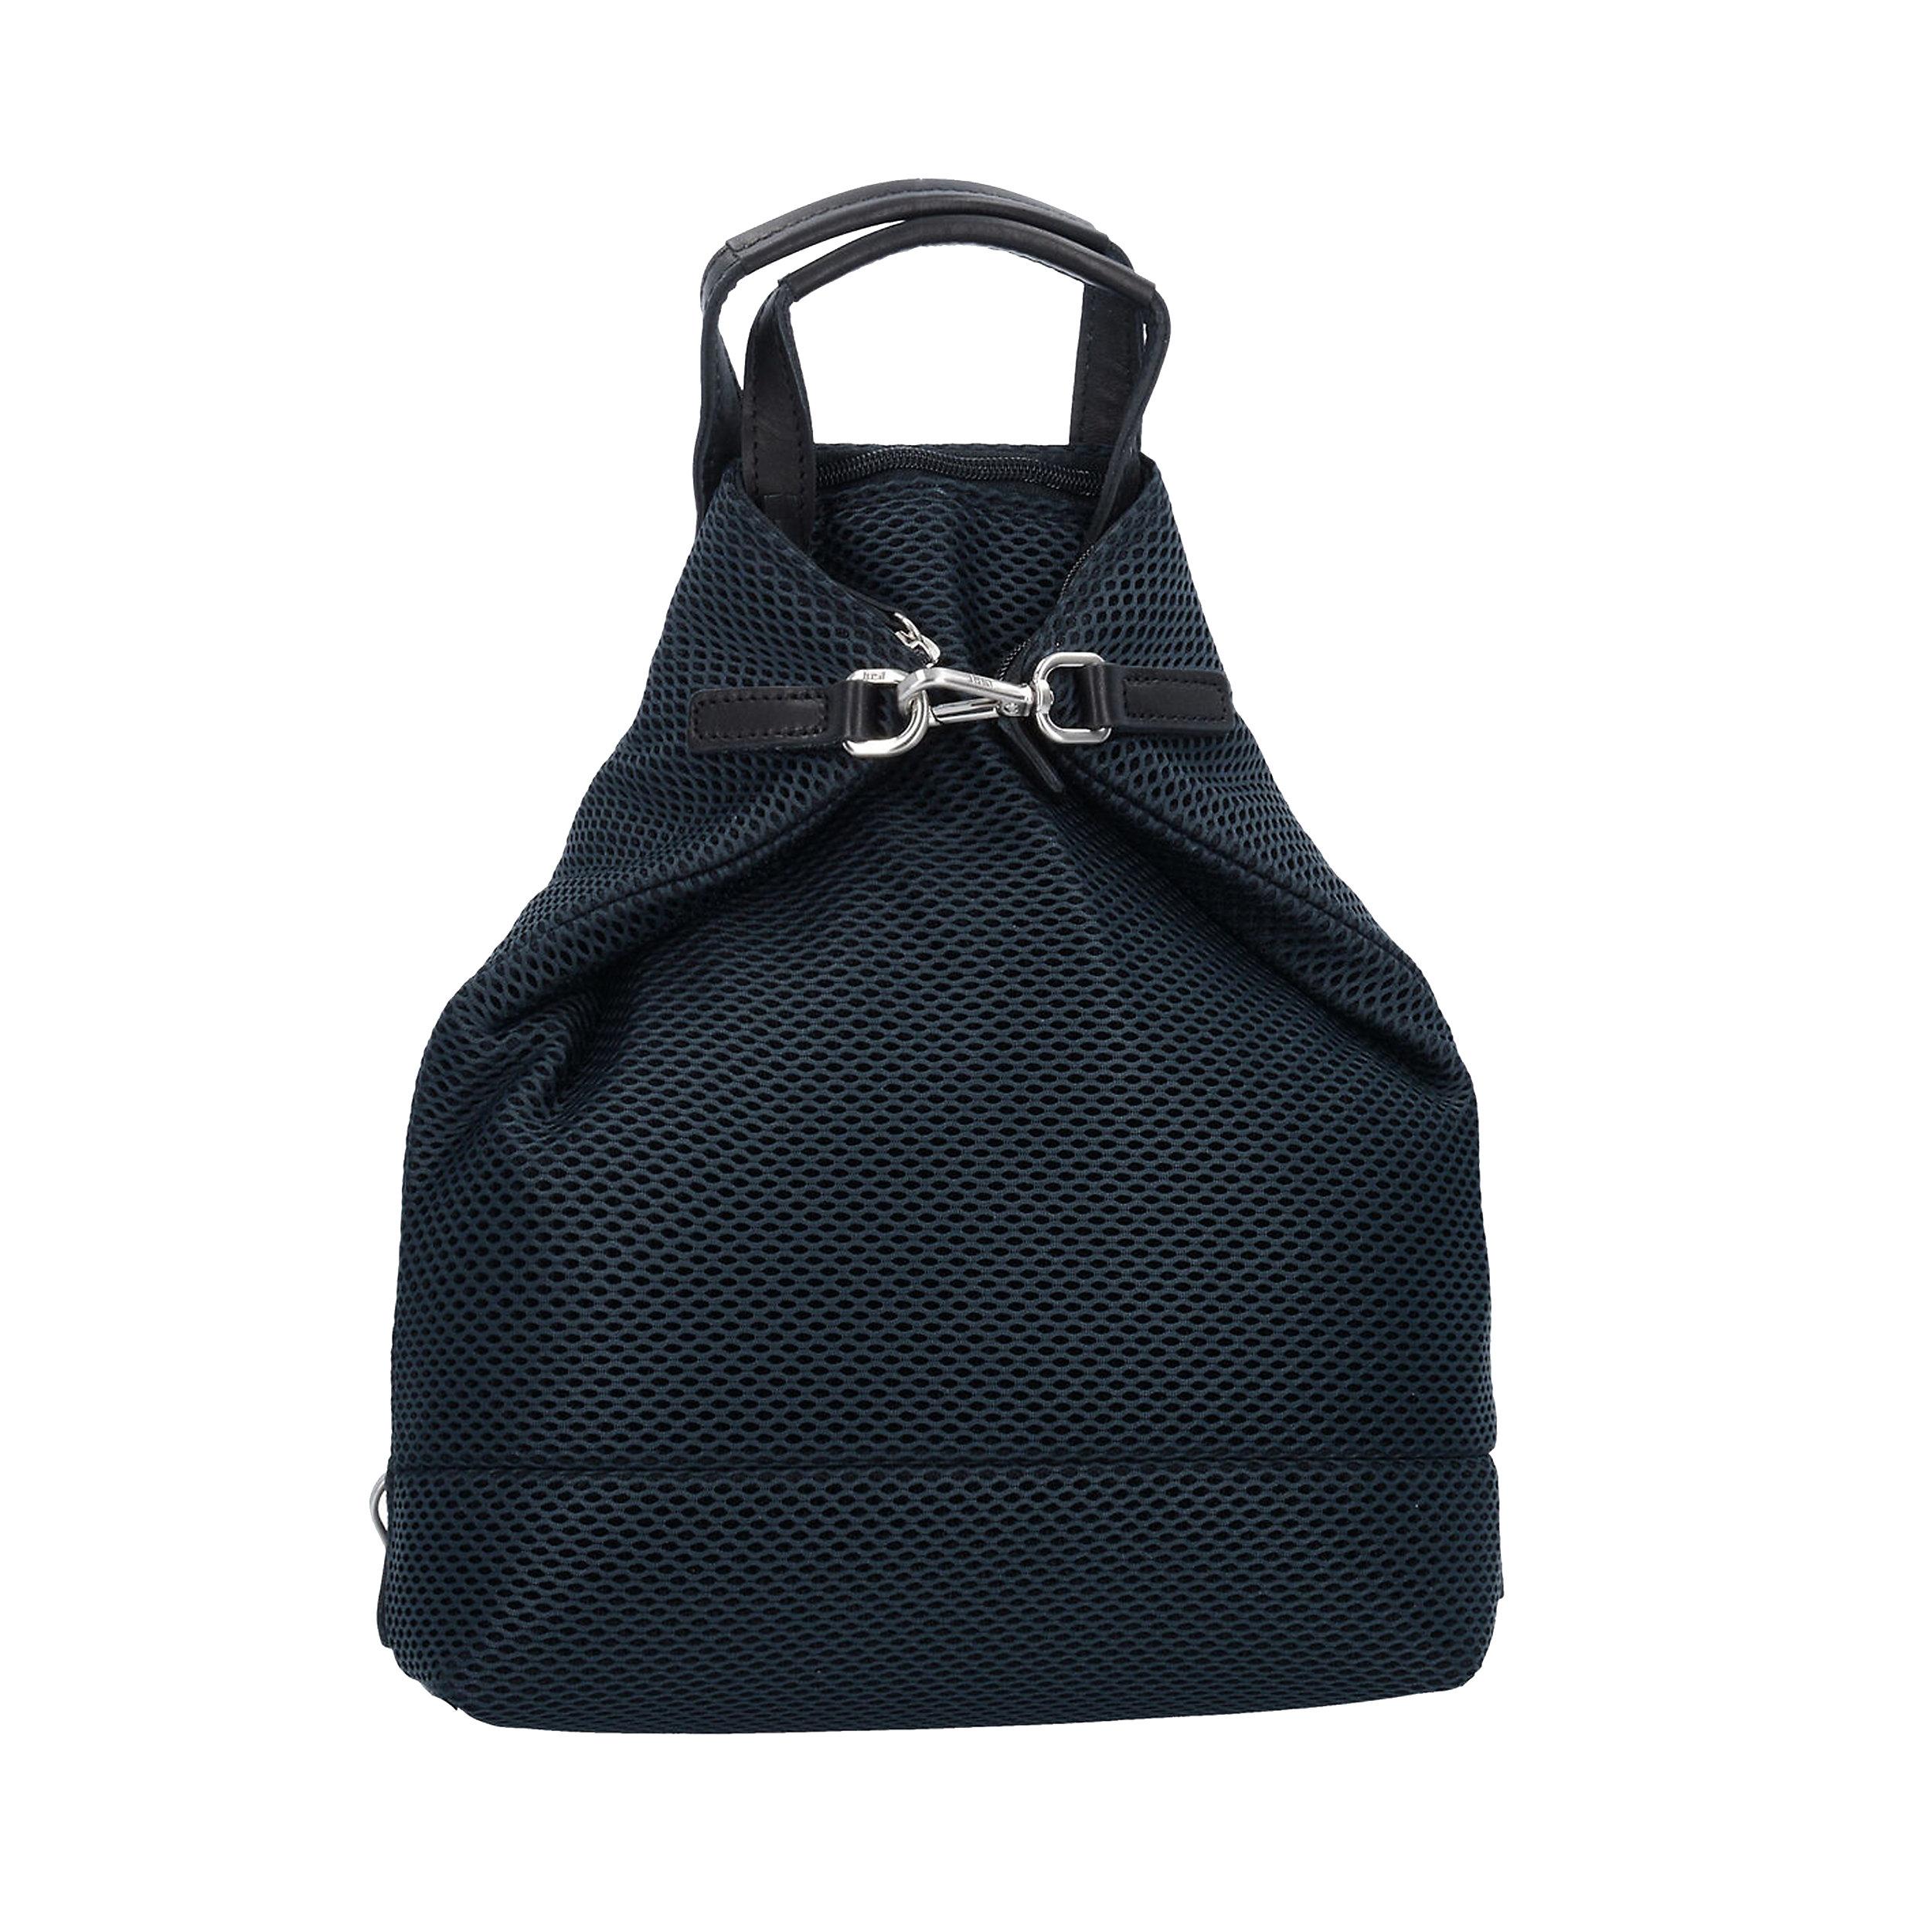 Backpack XChange Bag 3in1 13 Inch XS Mesh 5 Liter